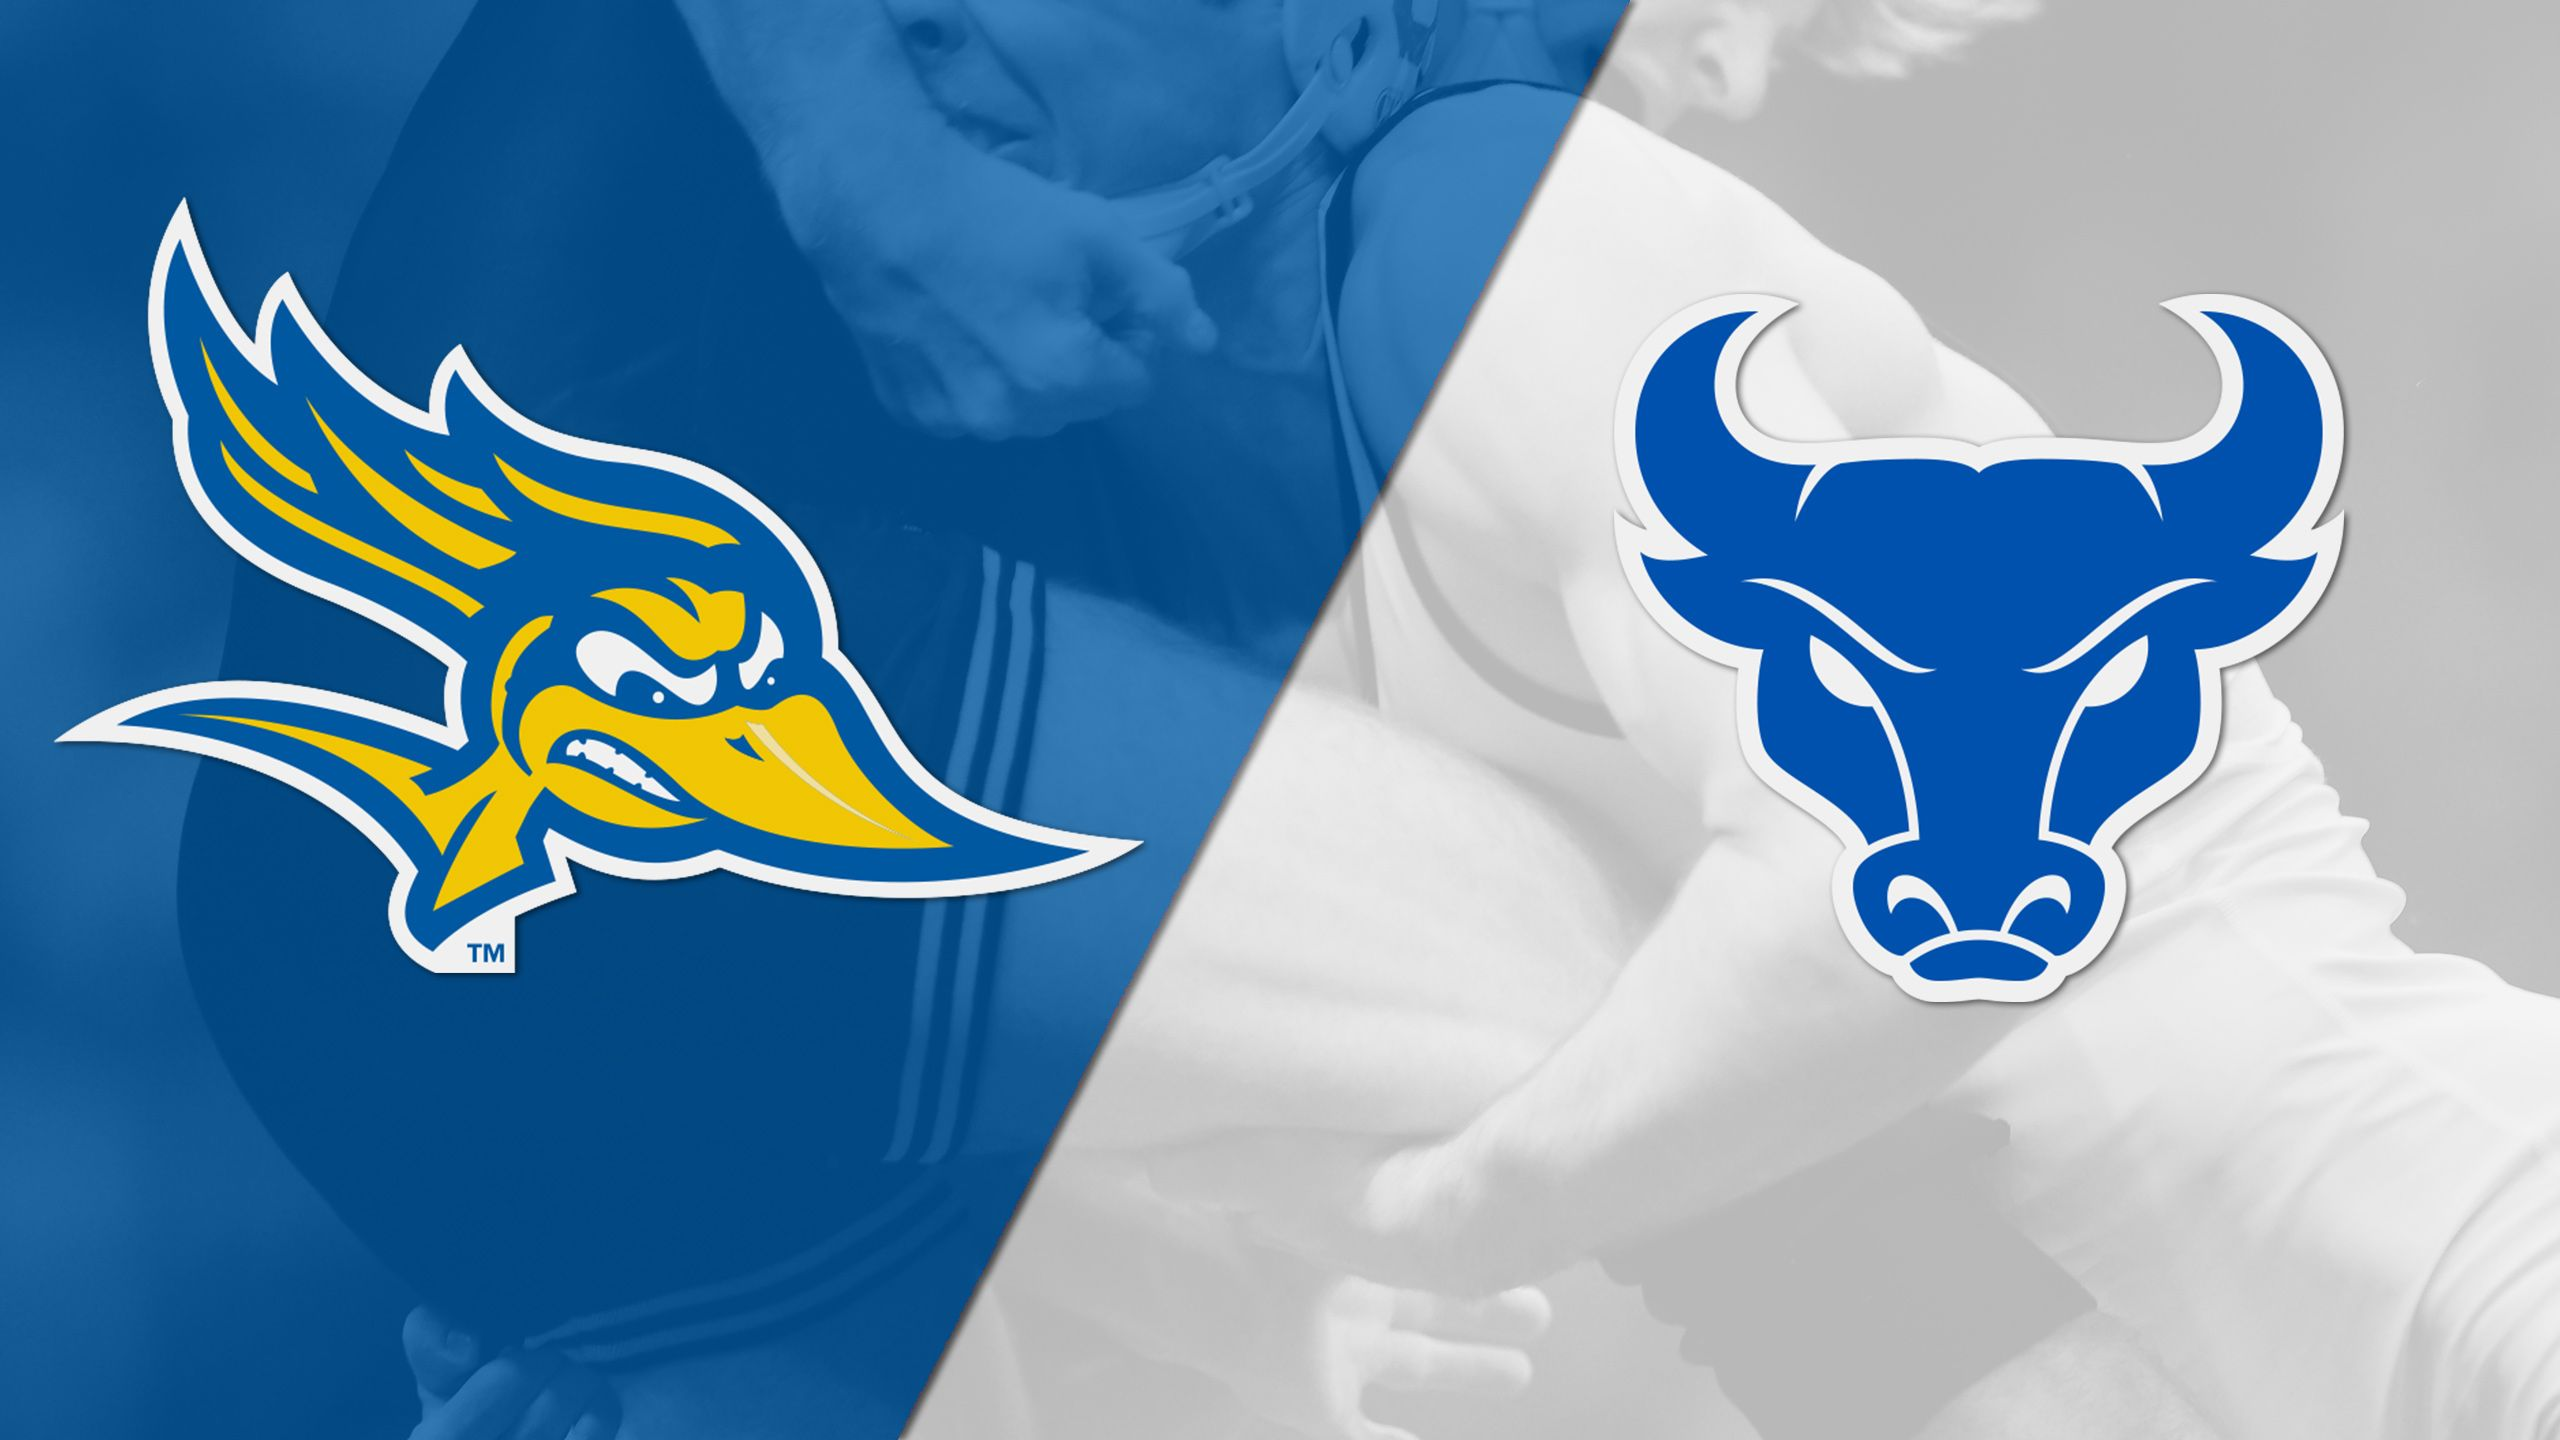 CSU Bakersfield vs. Buffalo (Wrestling)